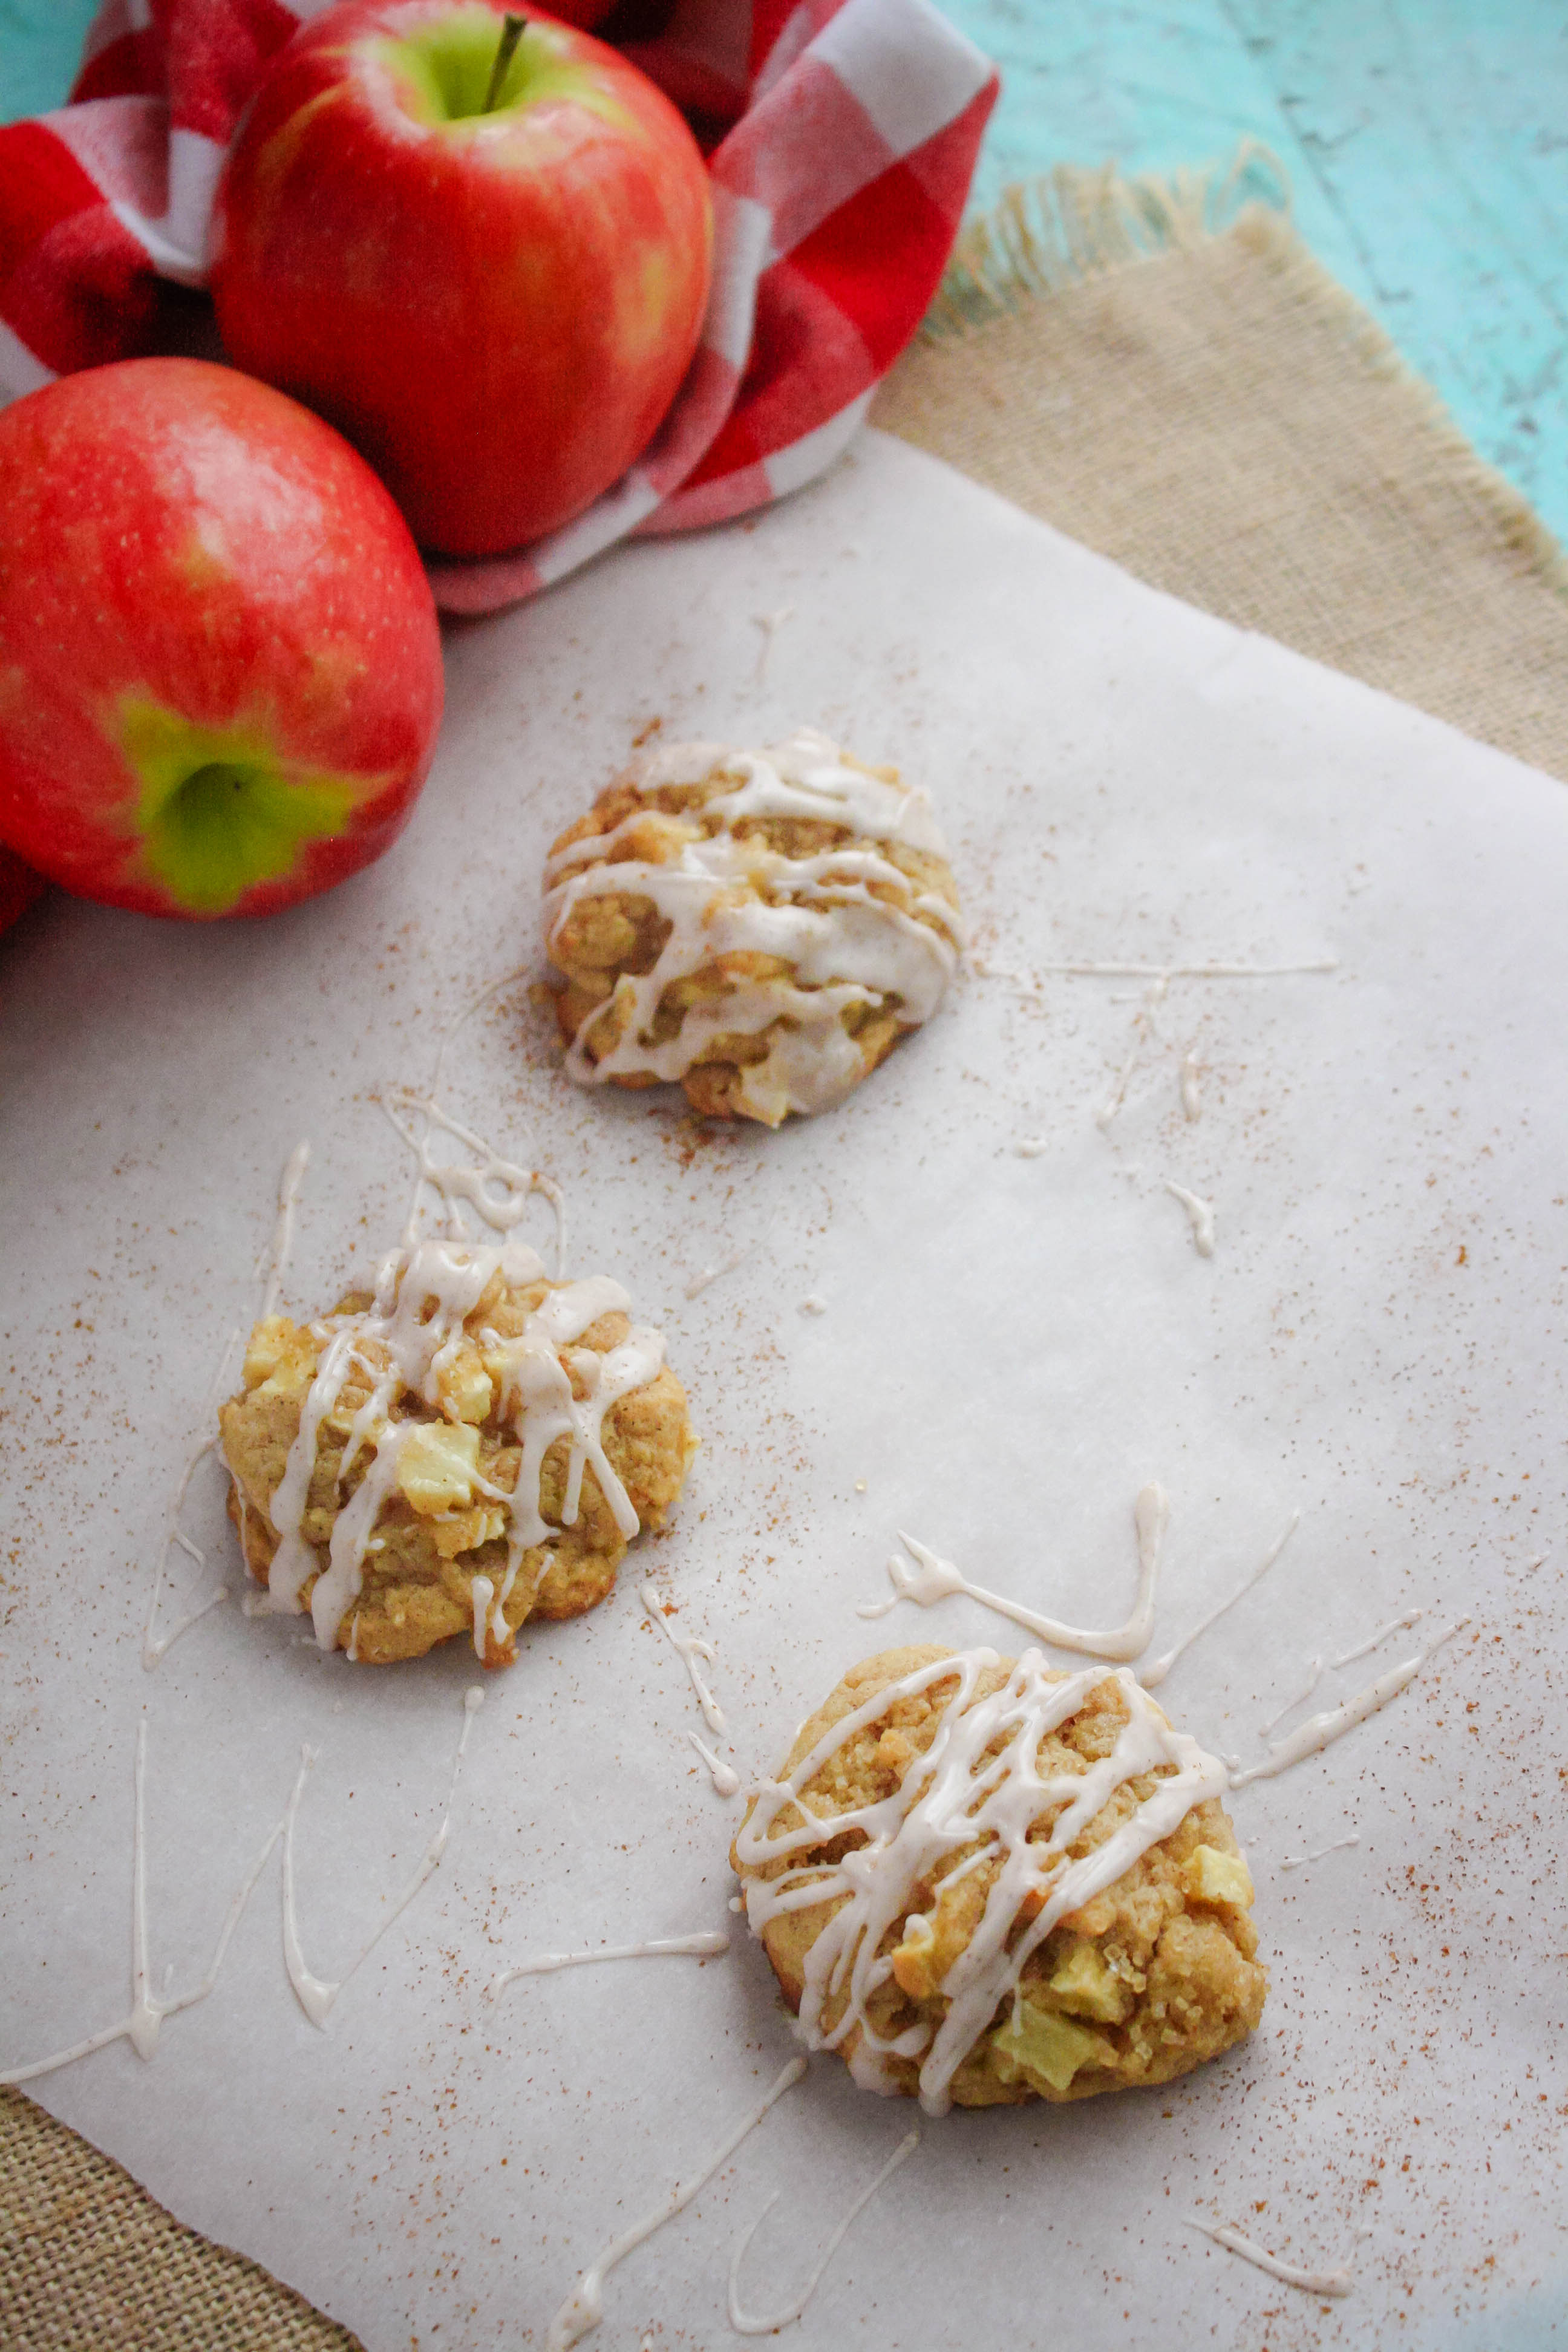 Apple Pie Cookies with Cinnamon Glaze are cookies you'll gobble up! Apple Pie Cookies with Cinnamon Glaze are tasty treats.